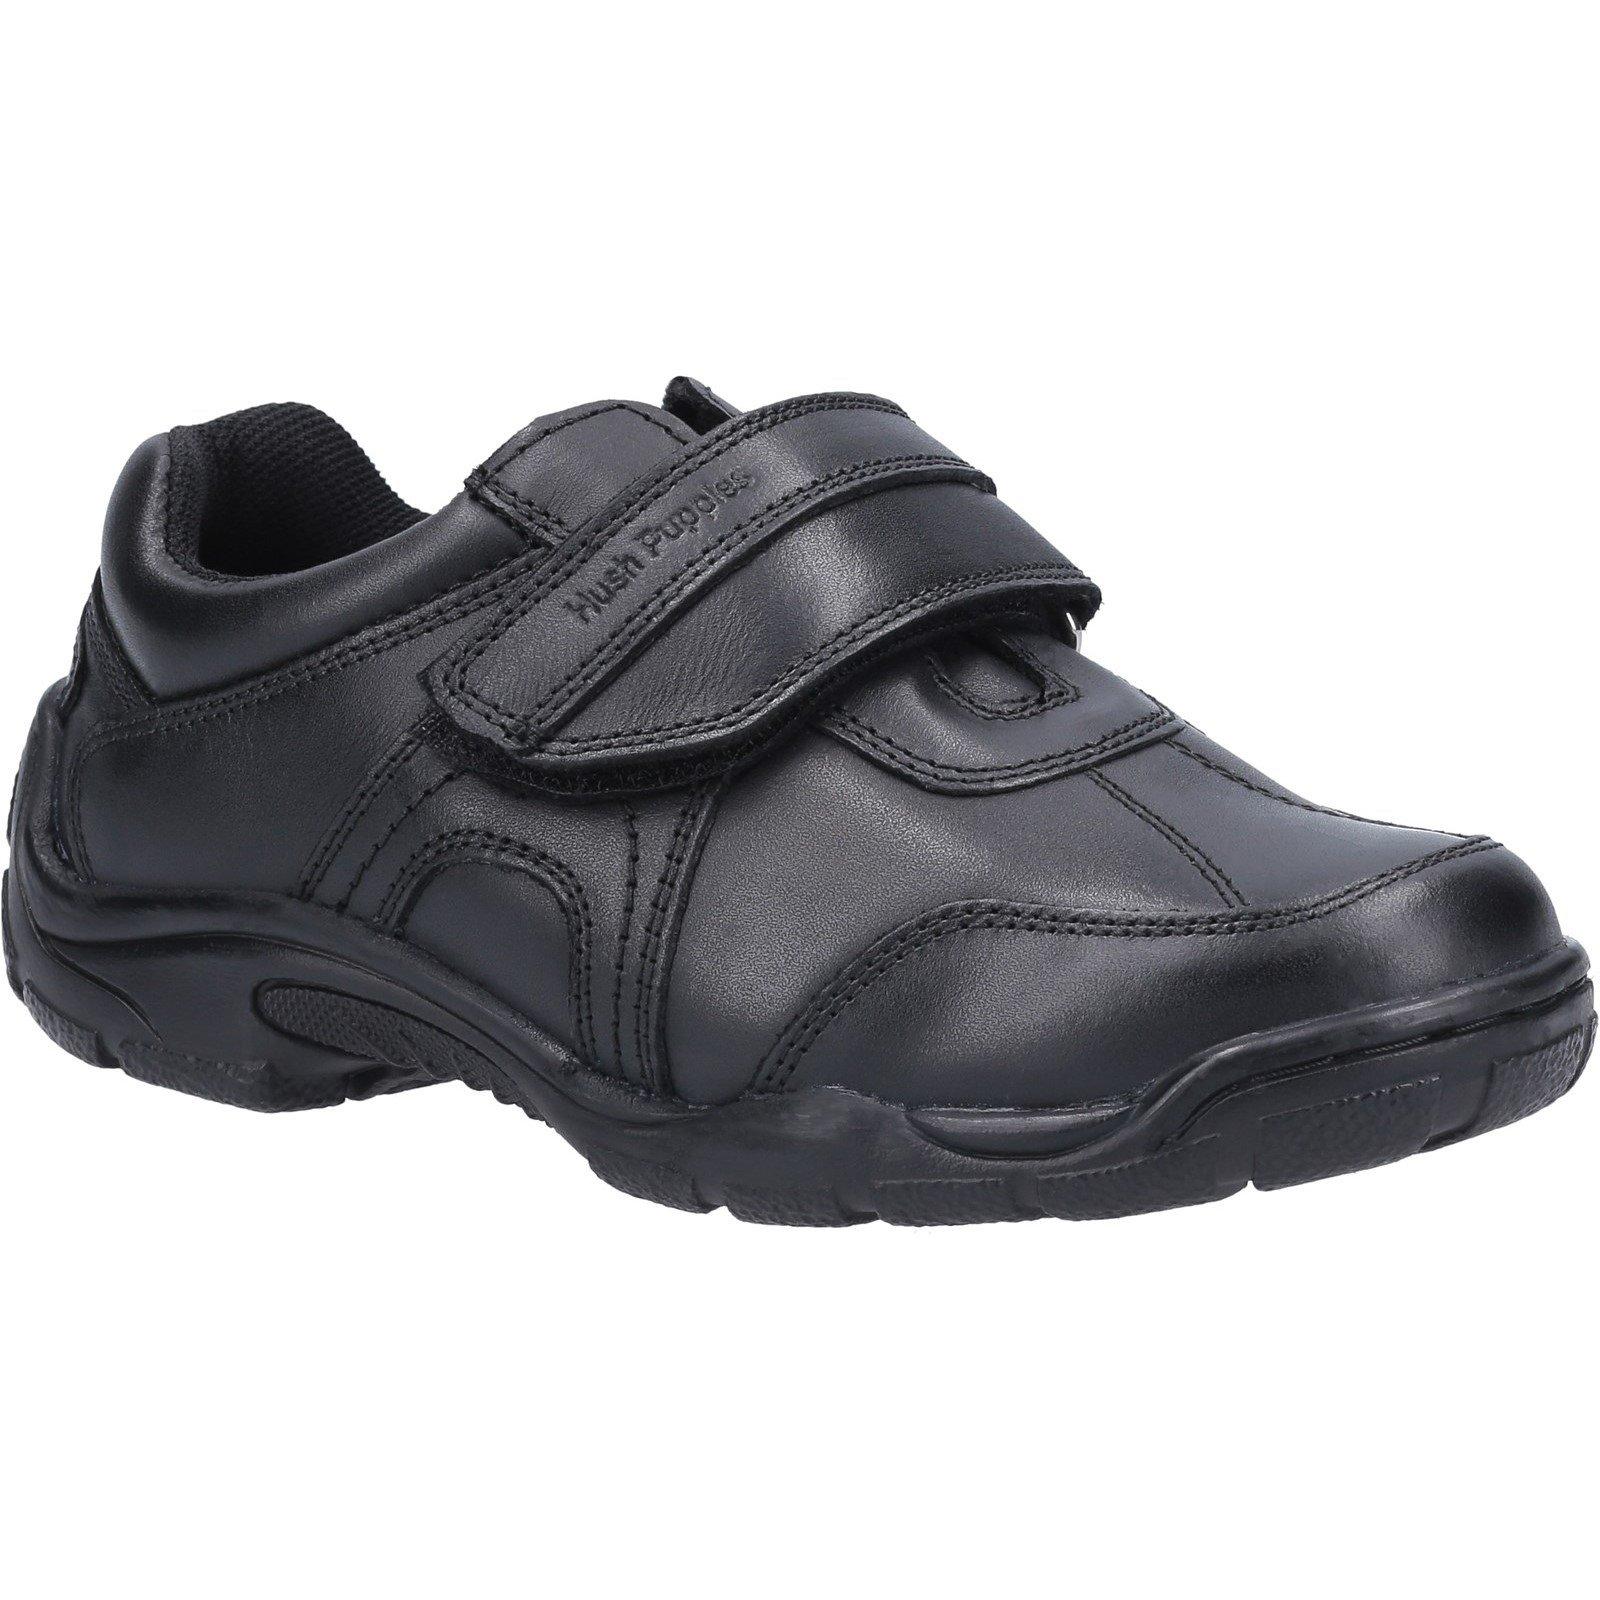 Hush Puppies Kid's Arlo Junior School Shoe Black 30853 - Black 13